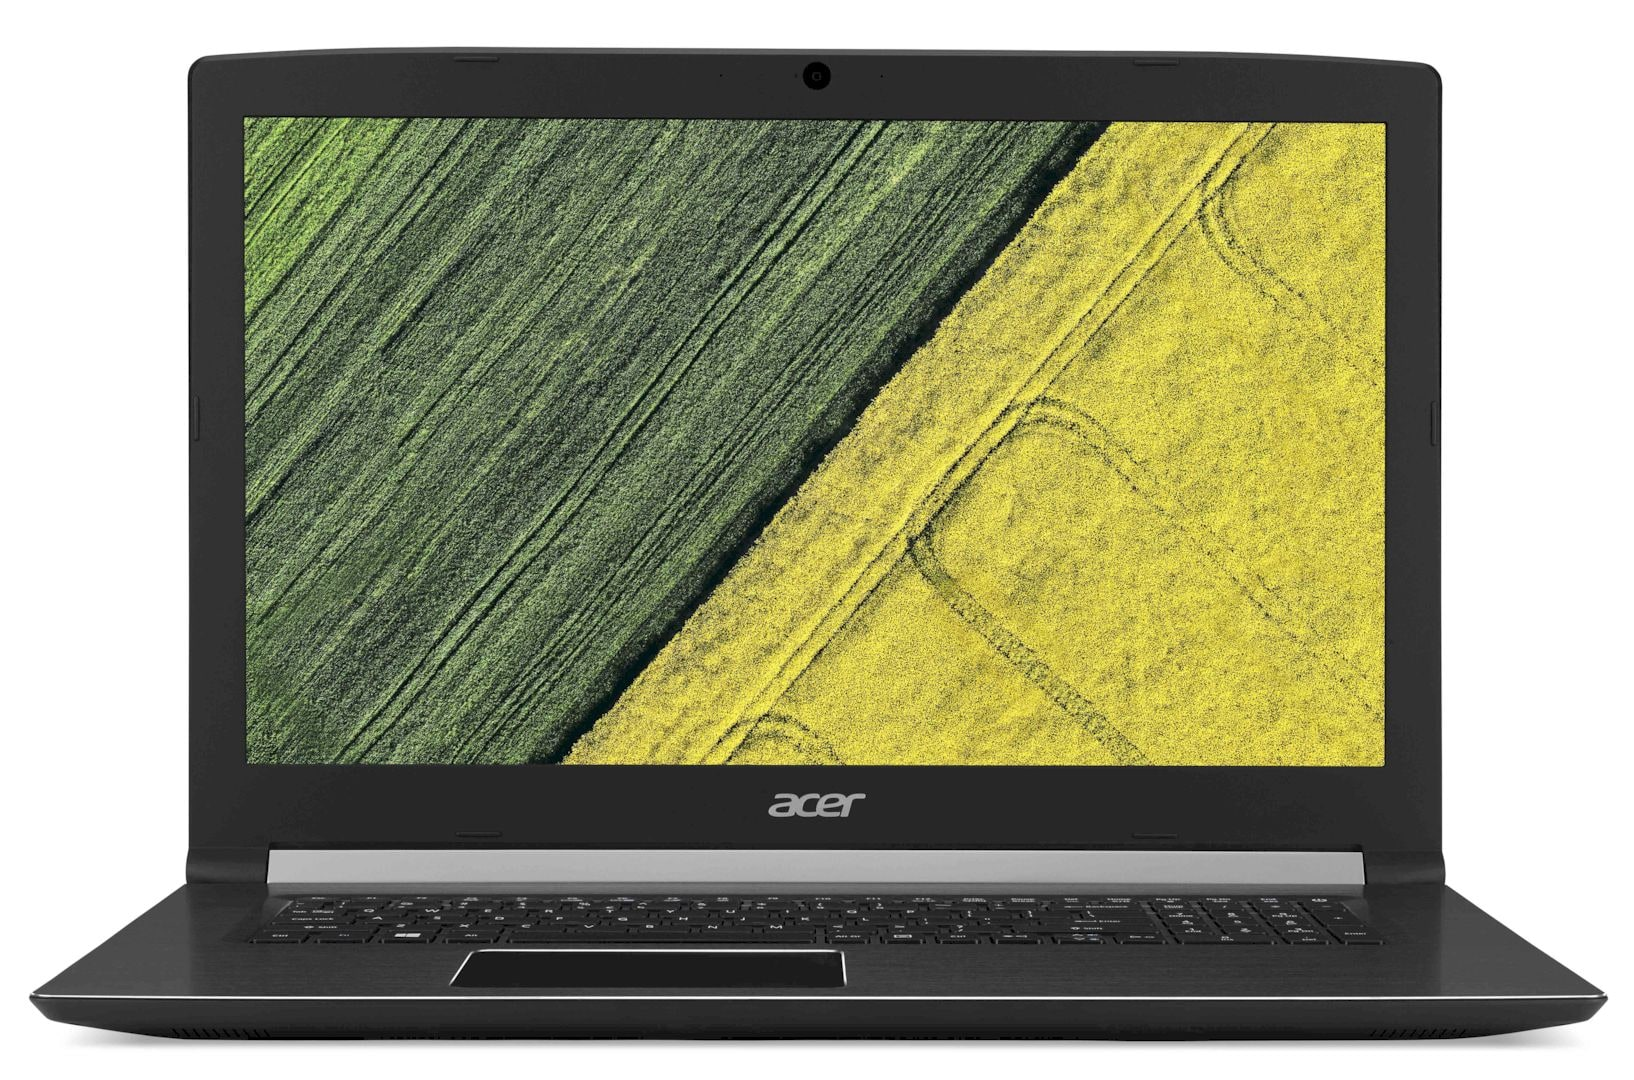 Acer Aspire 7 2017 (2)